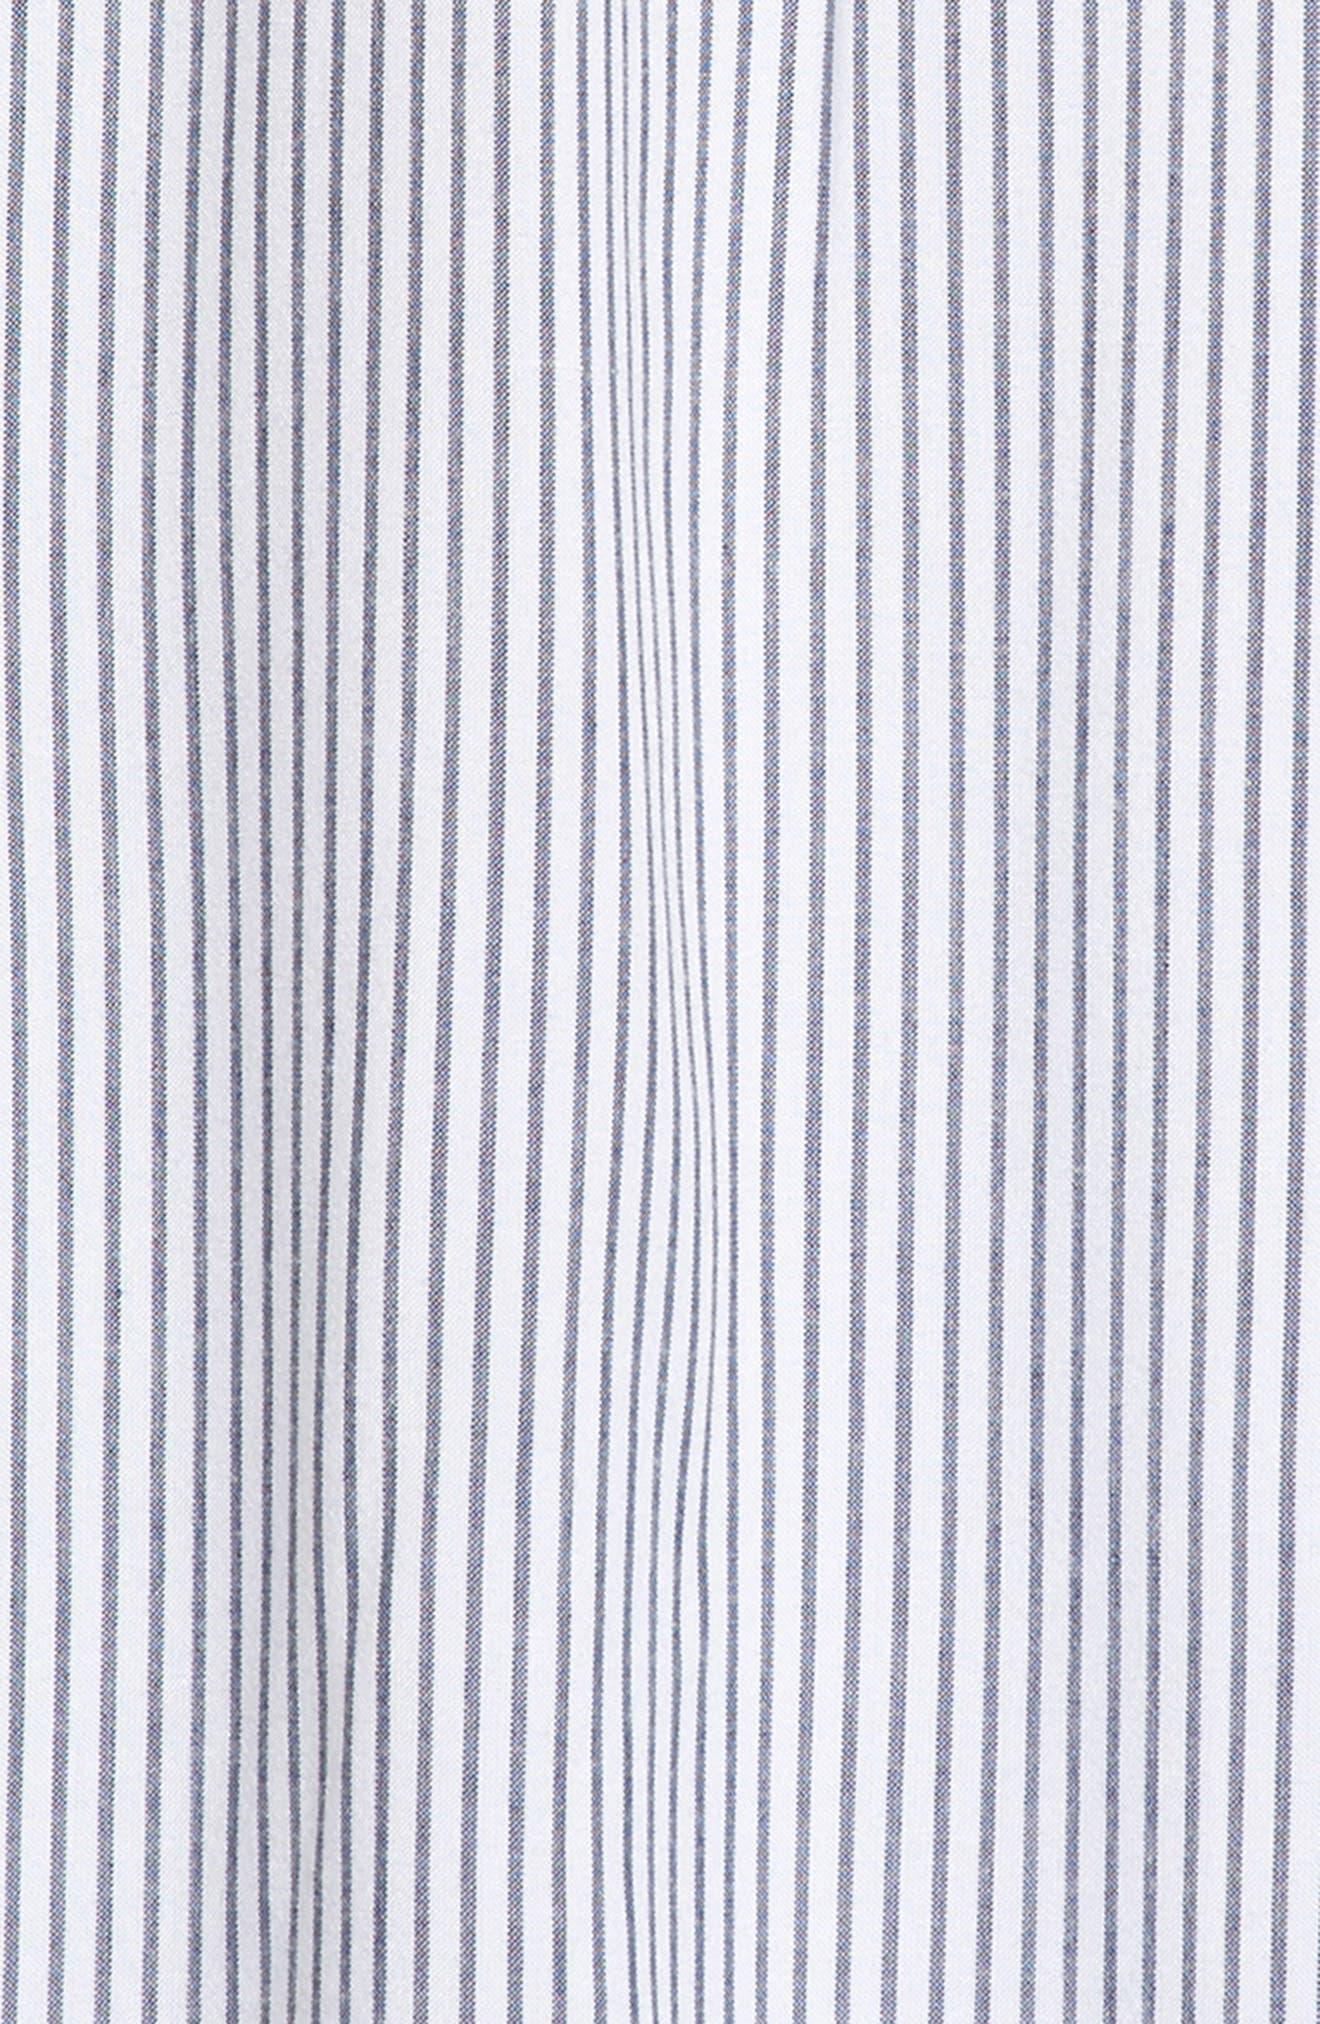 Ruffle Cold Shoulder Dress,                             Alternate thumbnail 3, color,                             100